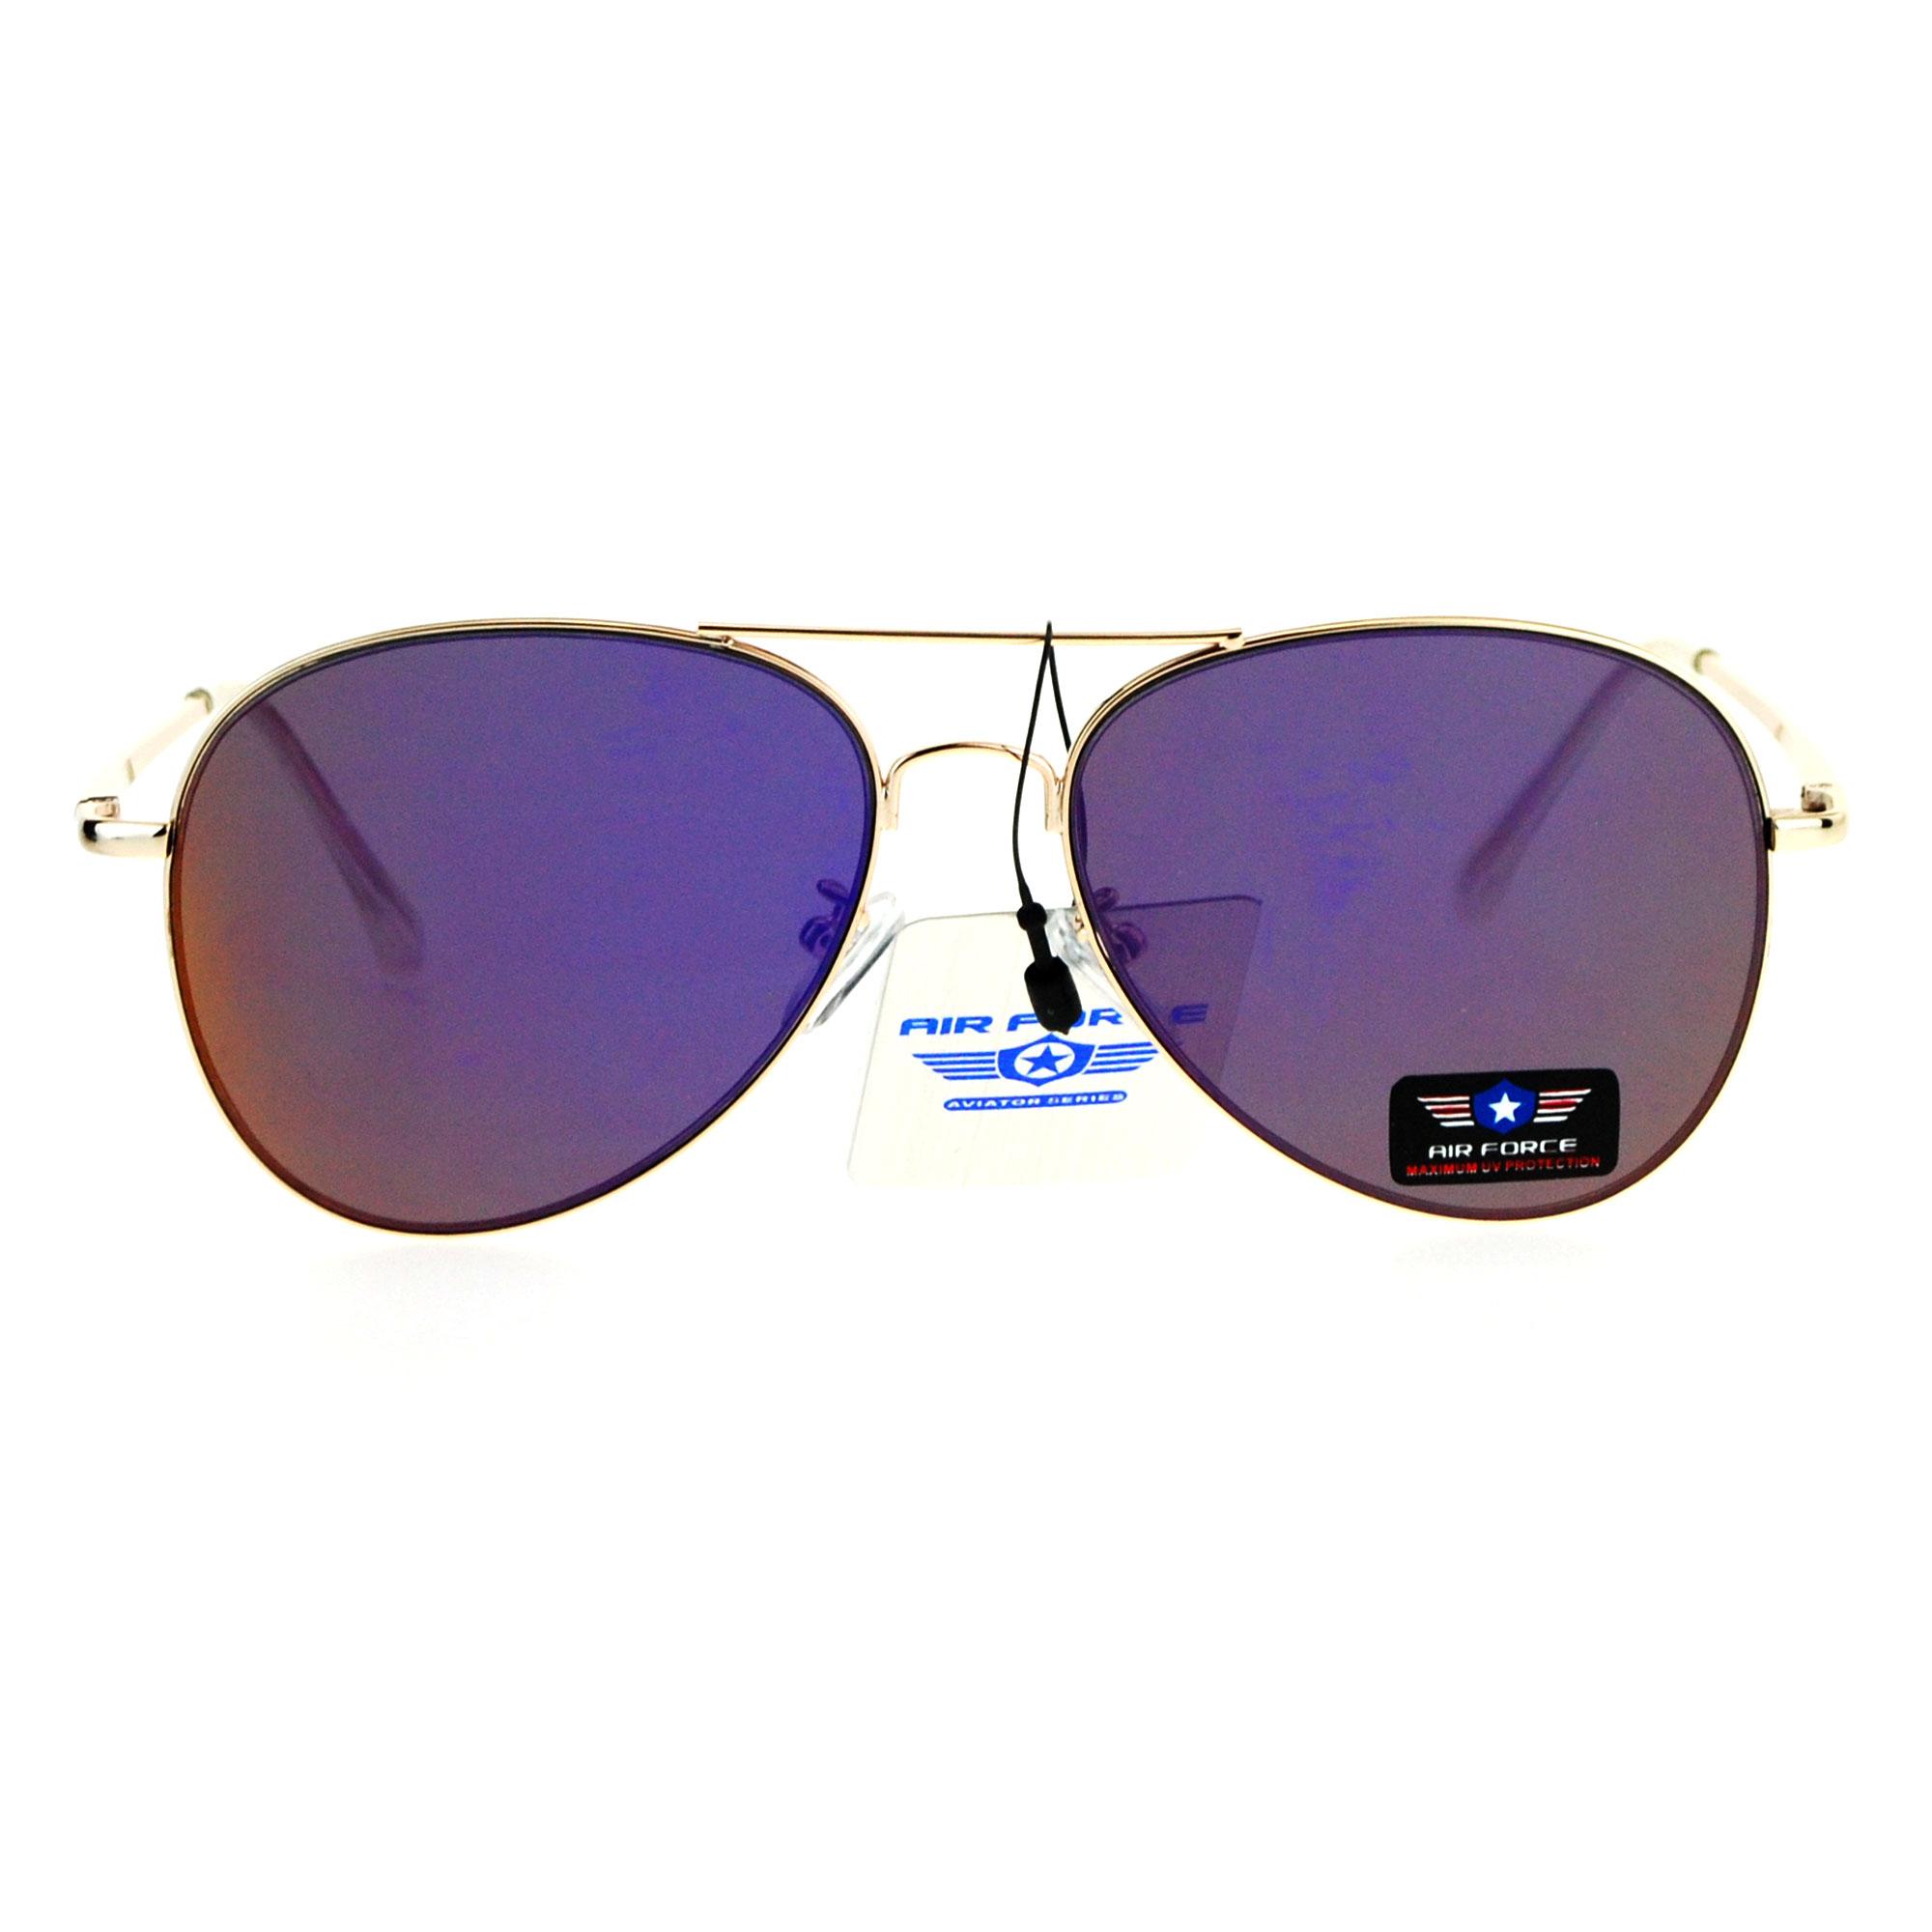 purple aviator sunglasses  Flat Panel Lens Classic Metal Rim Police Style Aviator Sunglasses ...